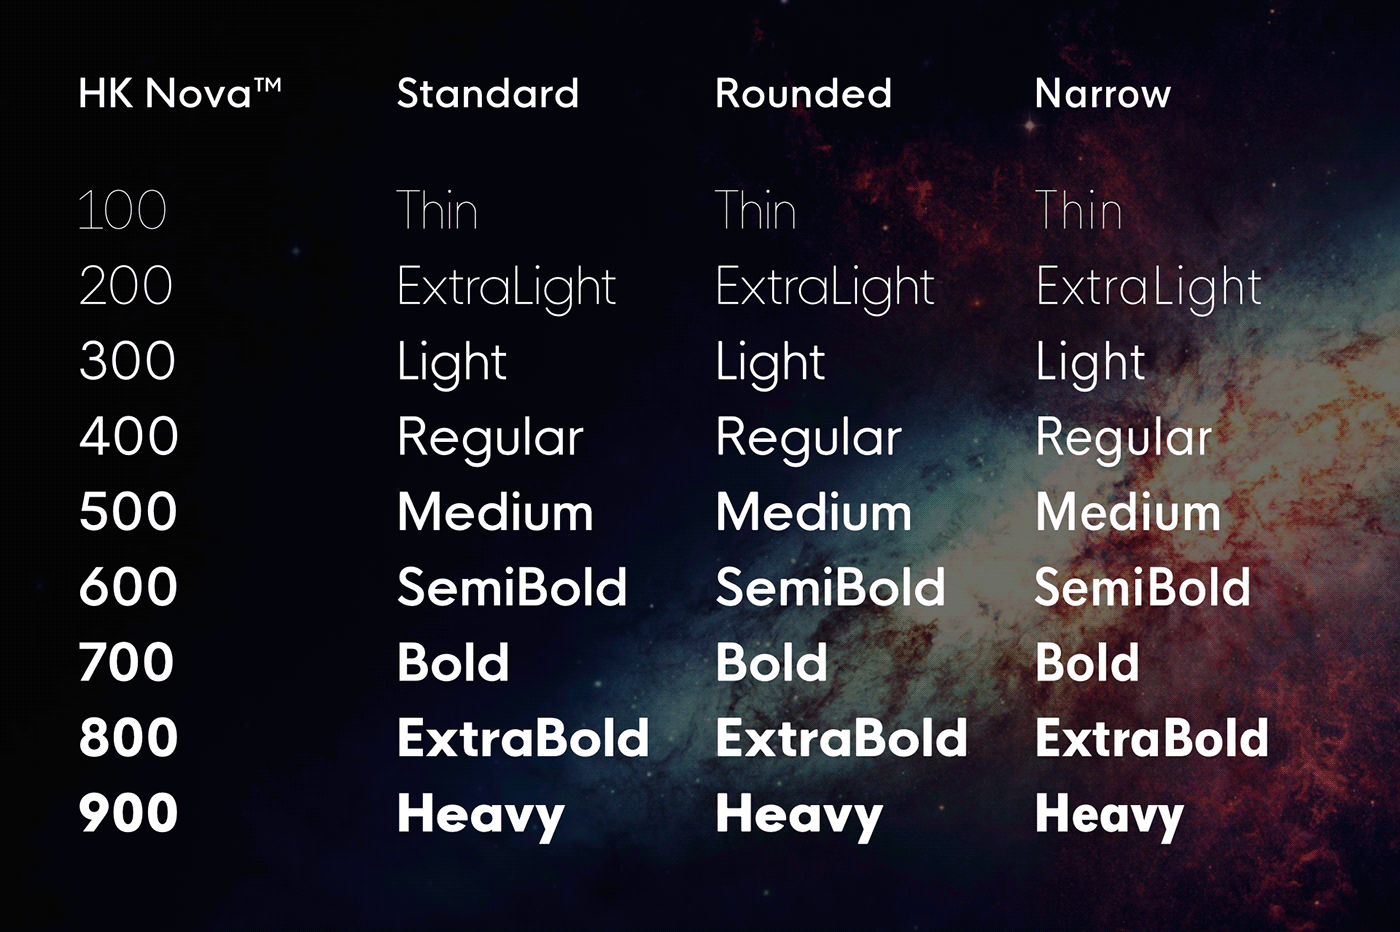 hk nova hdcfonts hanken design fonts Typeface free gratis libre